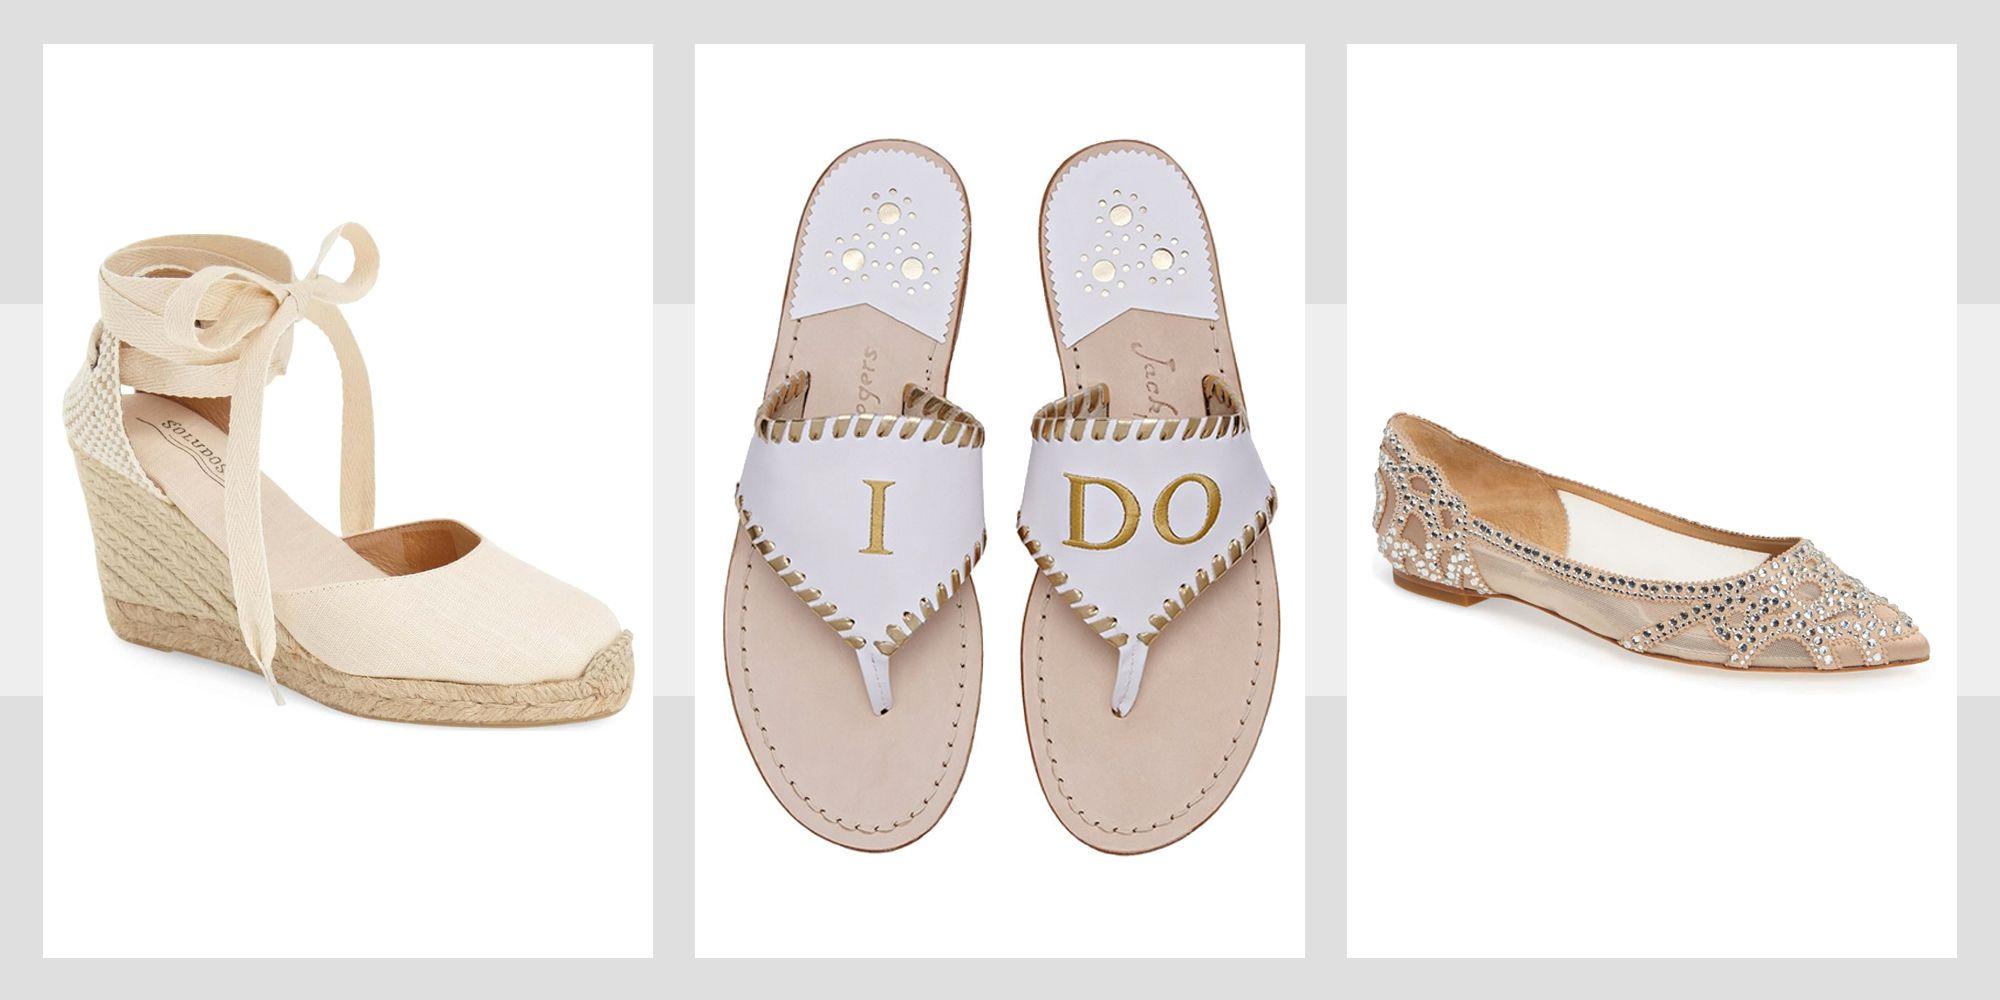 tc beach wedding shoes 1551825624.jpg?crop=1.00xw:1 - beach wedding shoes men